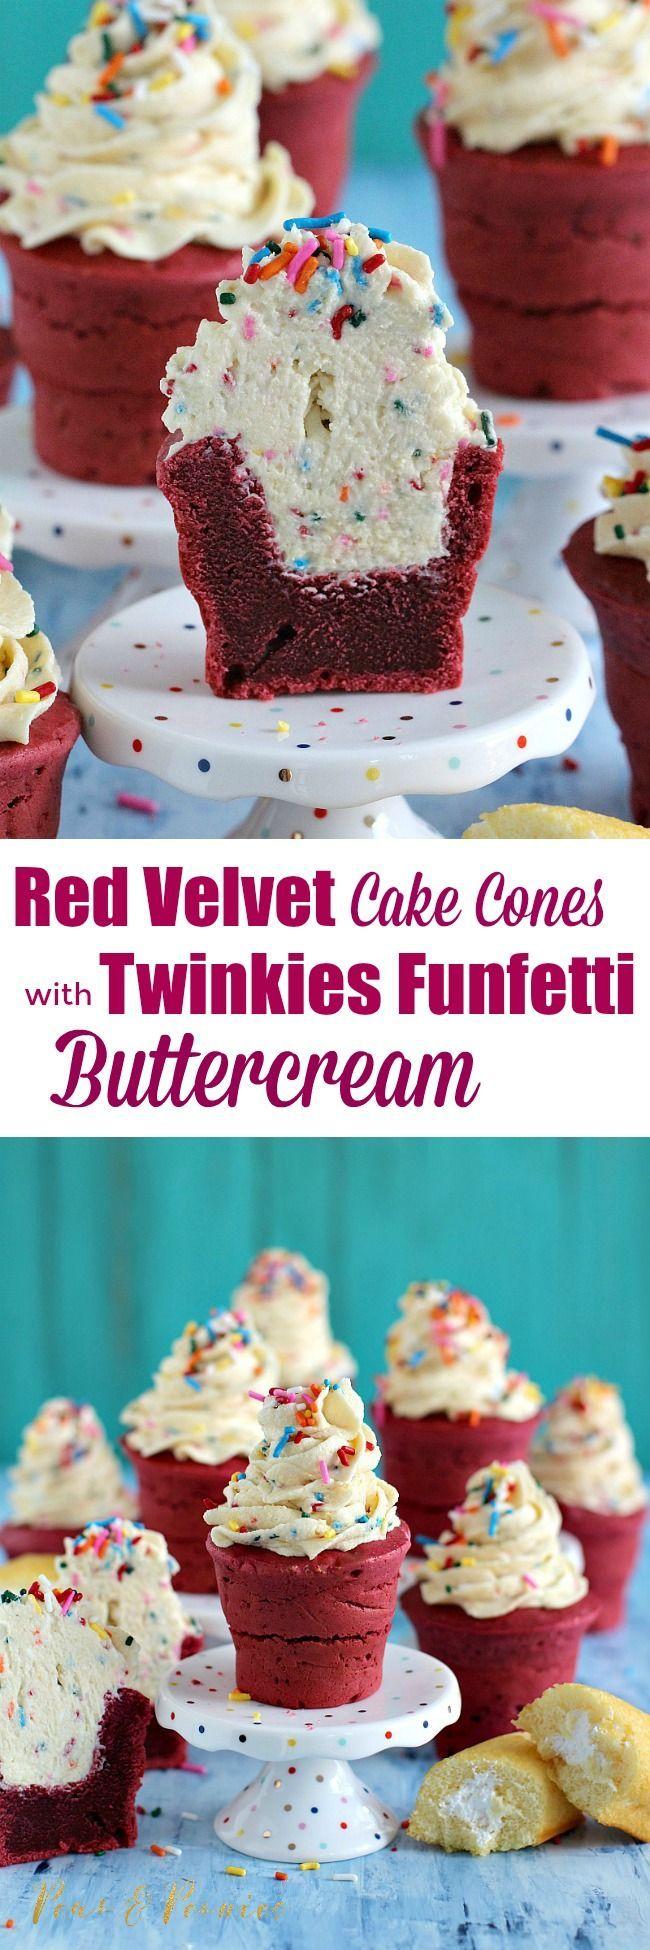 Red Velvet Cake Cone